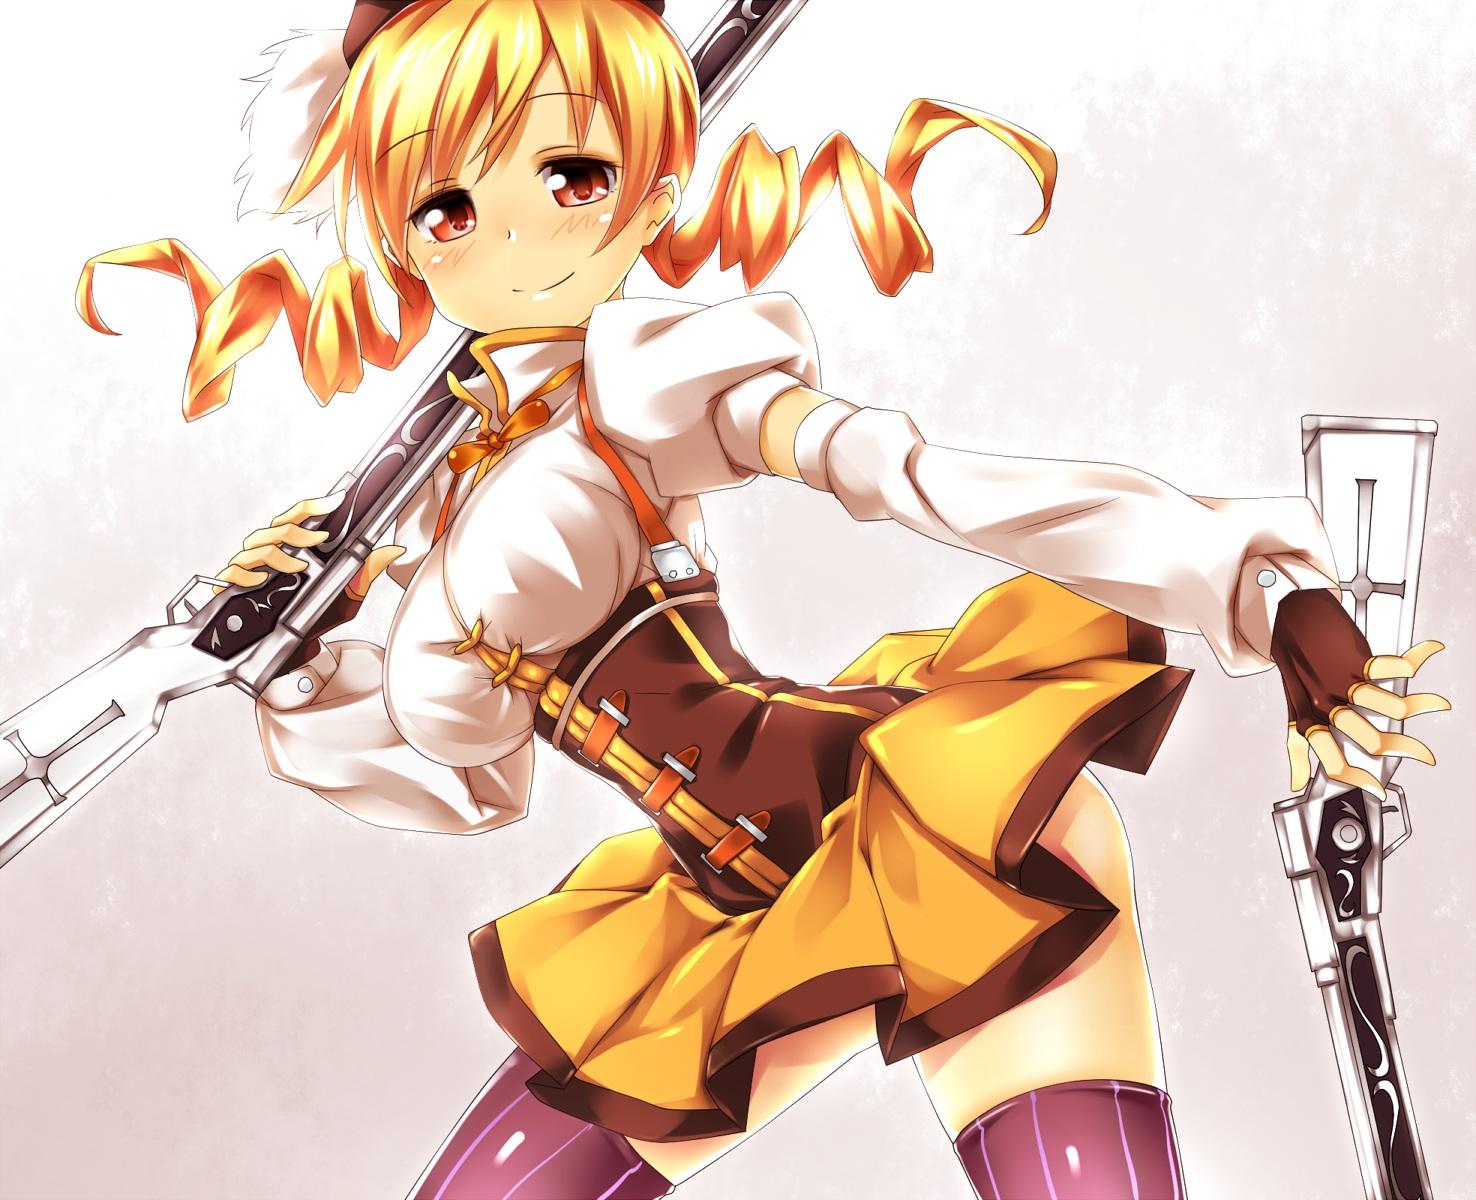 blonde_hair gloves gun hat keikotsu long_hair mahou_shoujo_madoka_magica red_eyes skirt thighhighs tomoe_mami twintails weapon